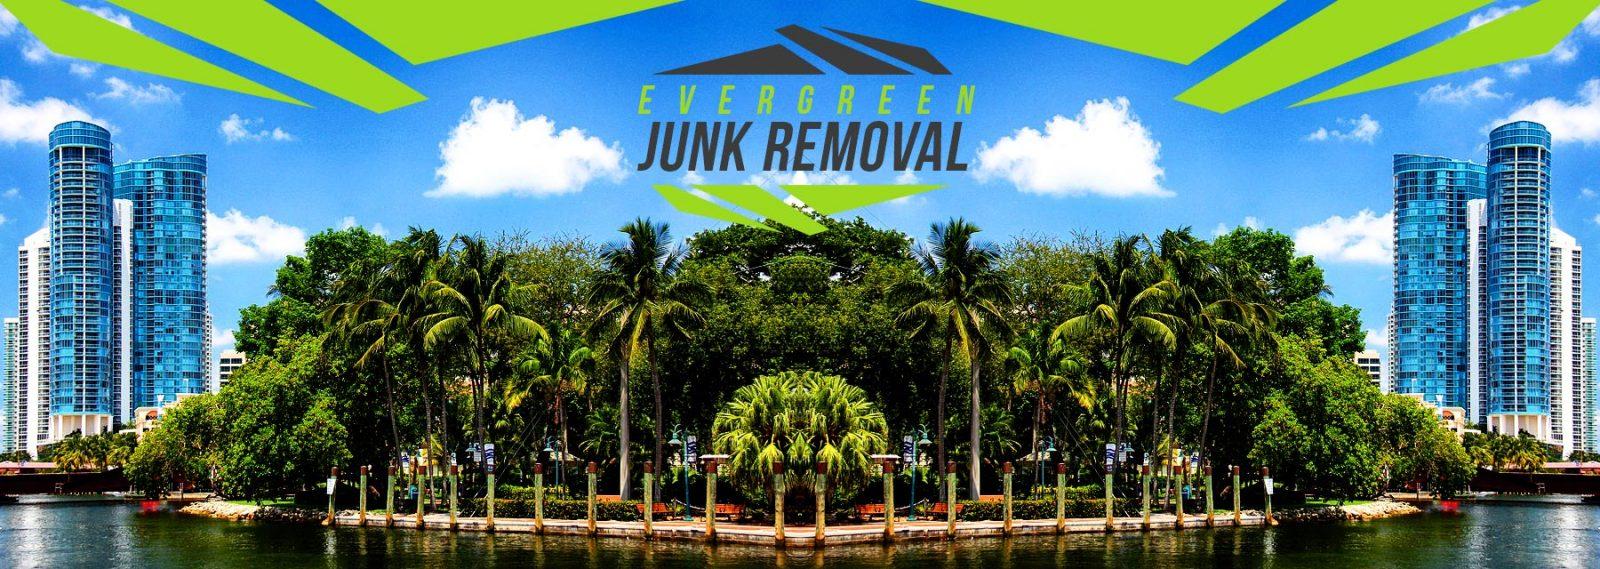 North Palm Beach Hot Tub Removal Company